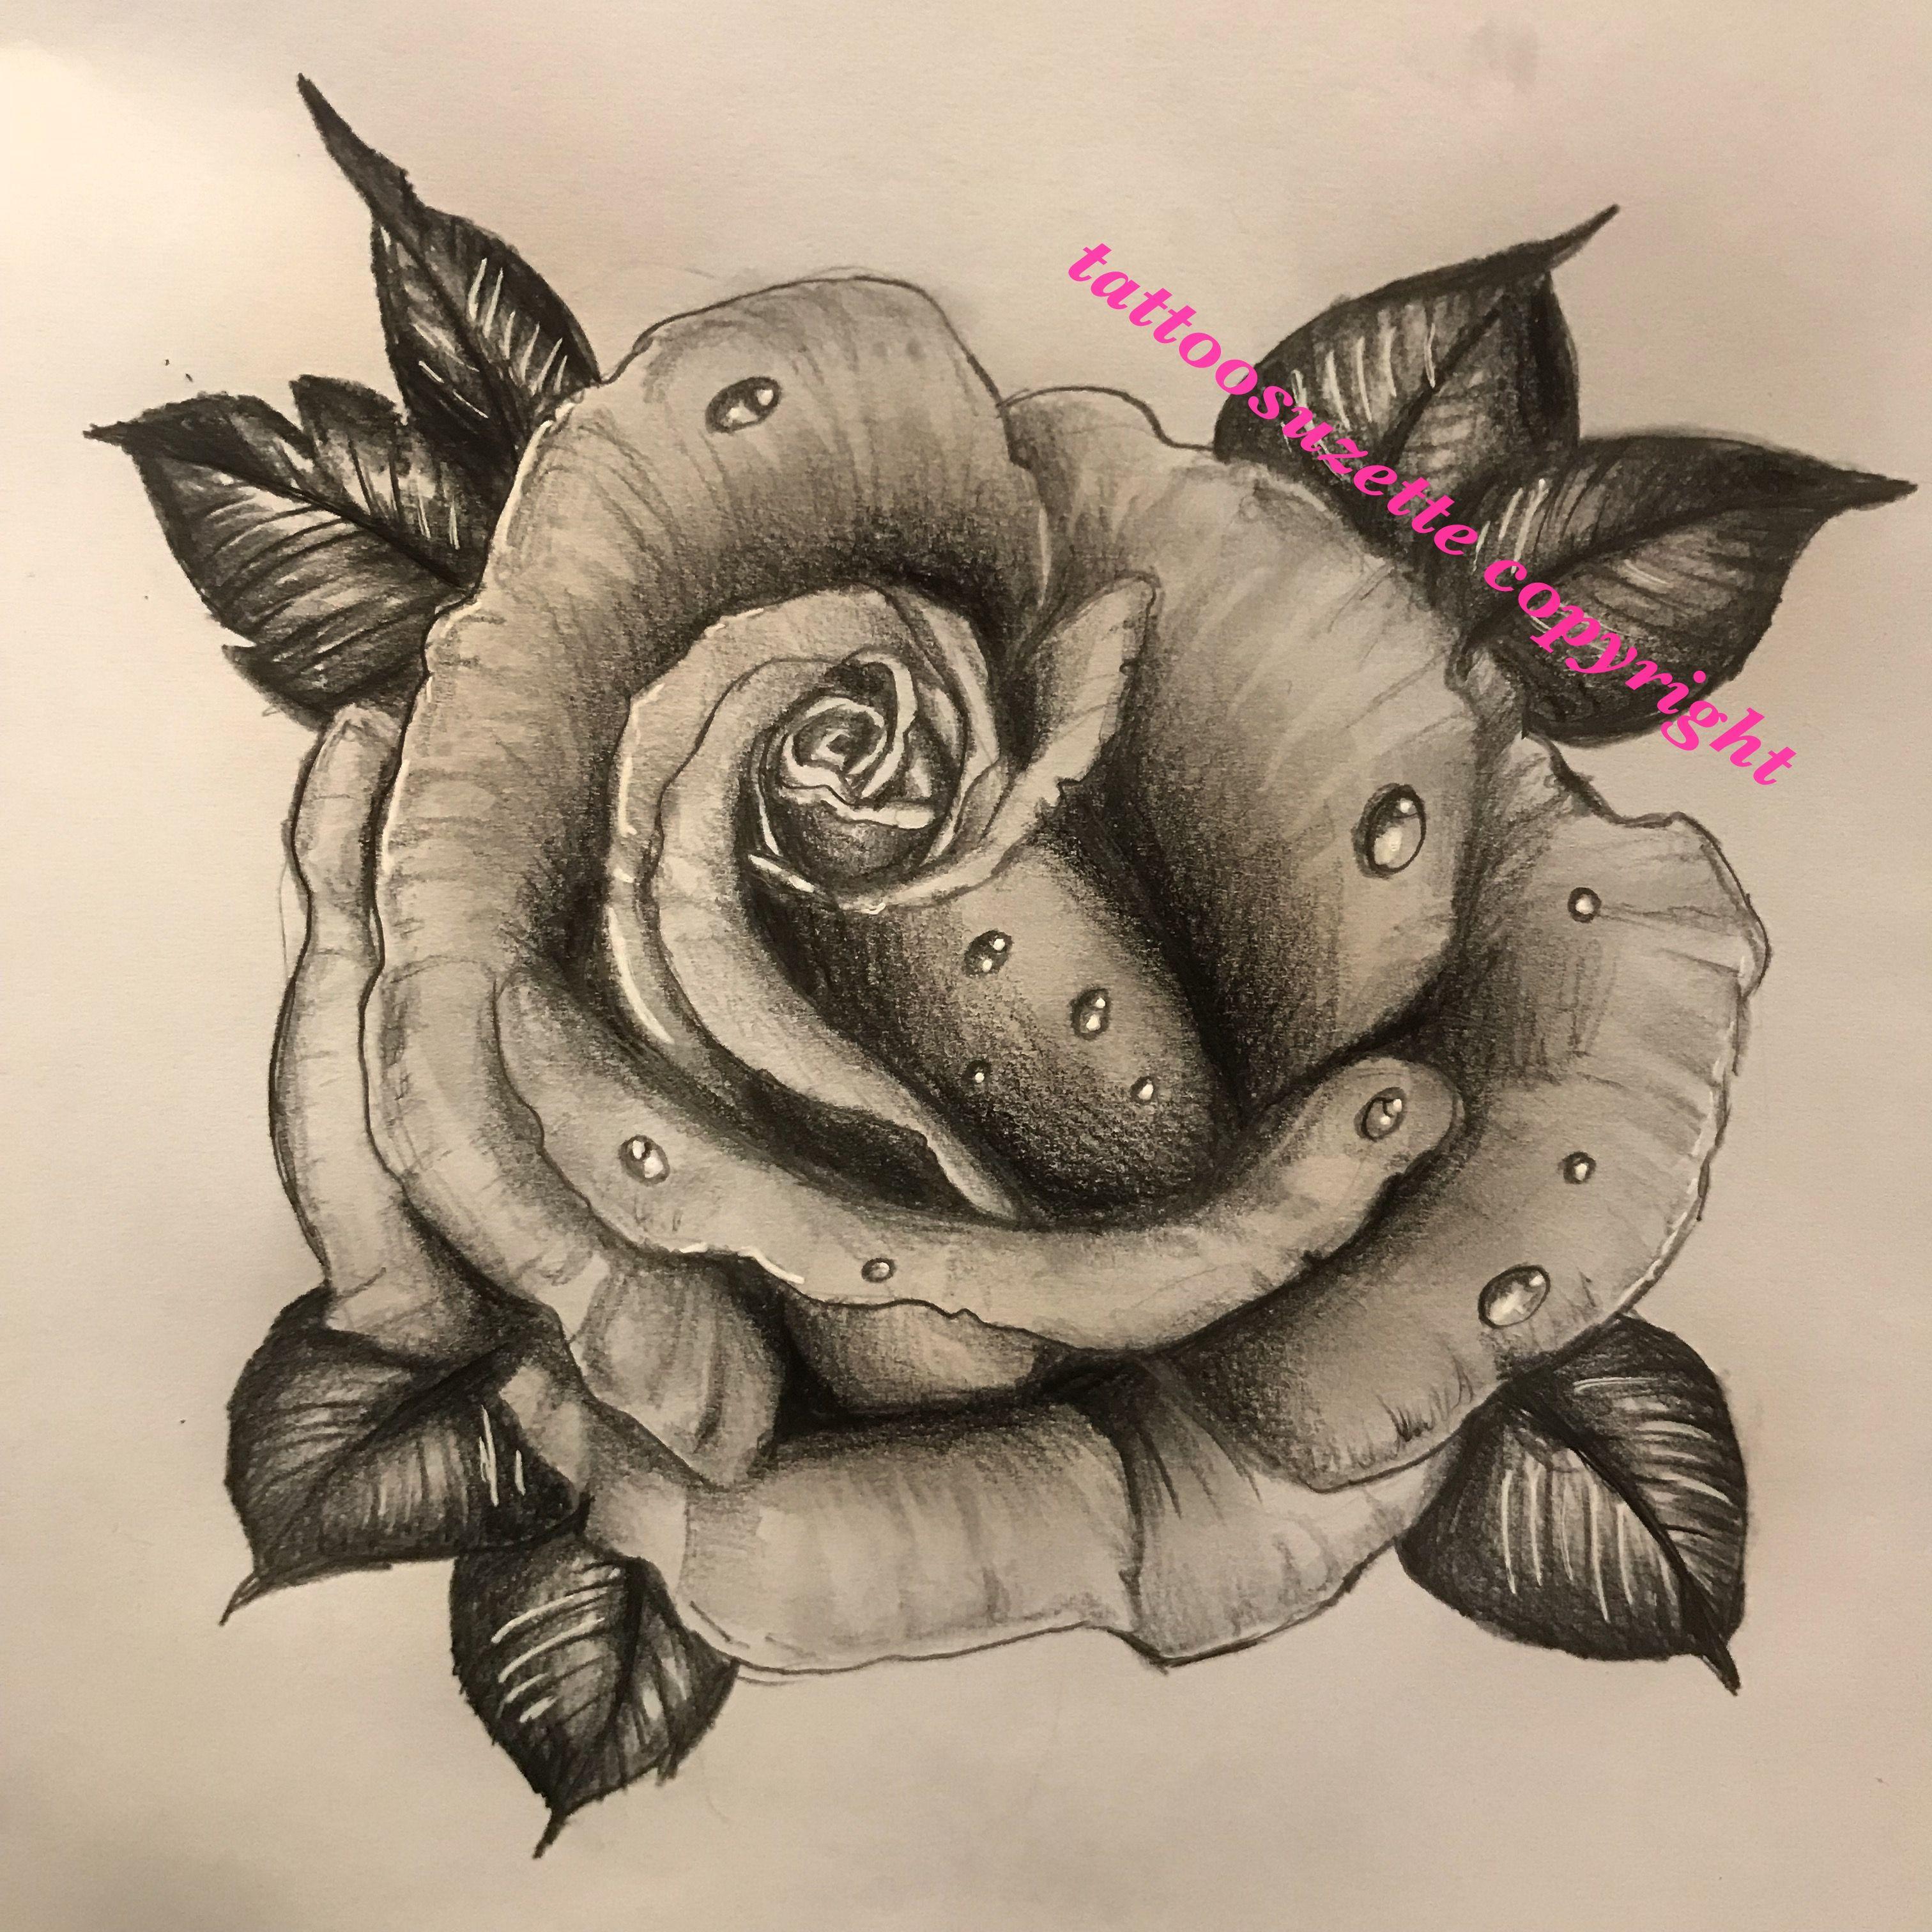 Black And Grey Rose Tattoo Design Rosetattoo Tattooflower Flowertattoo Tattoorose Traditional Rose Tattoos Black Rose Tattoo Meaning White Flower Tattoos